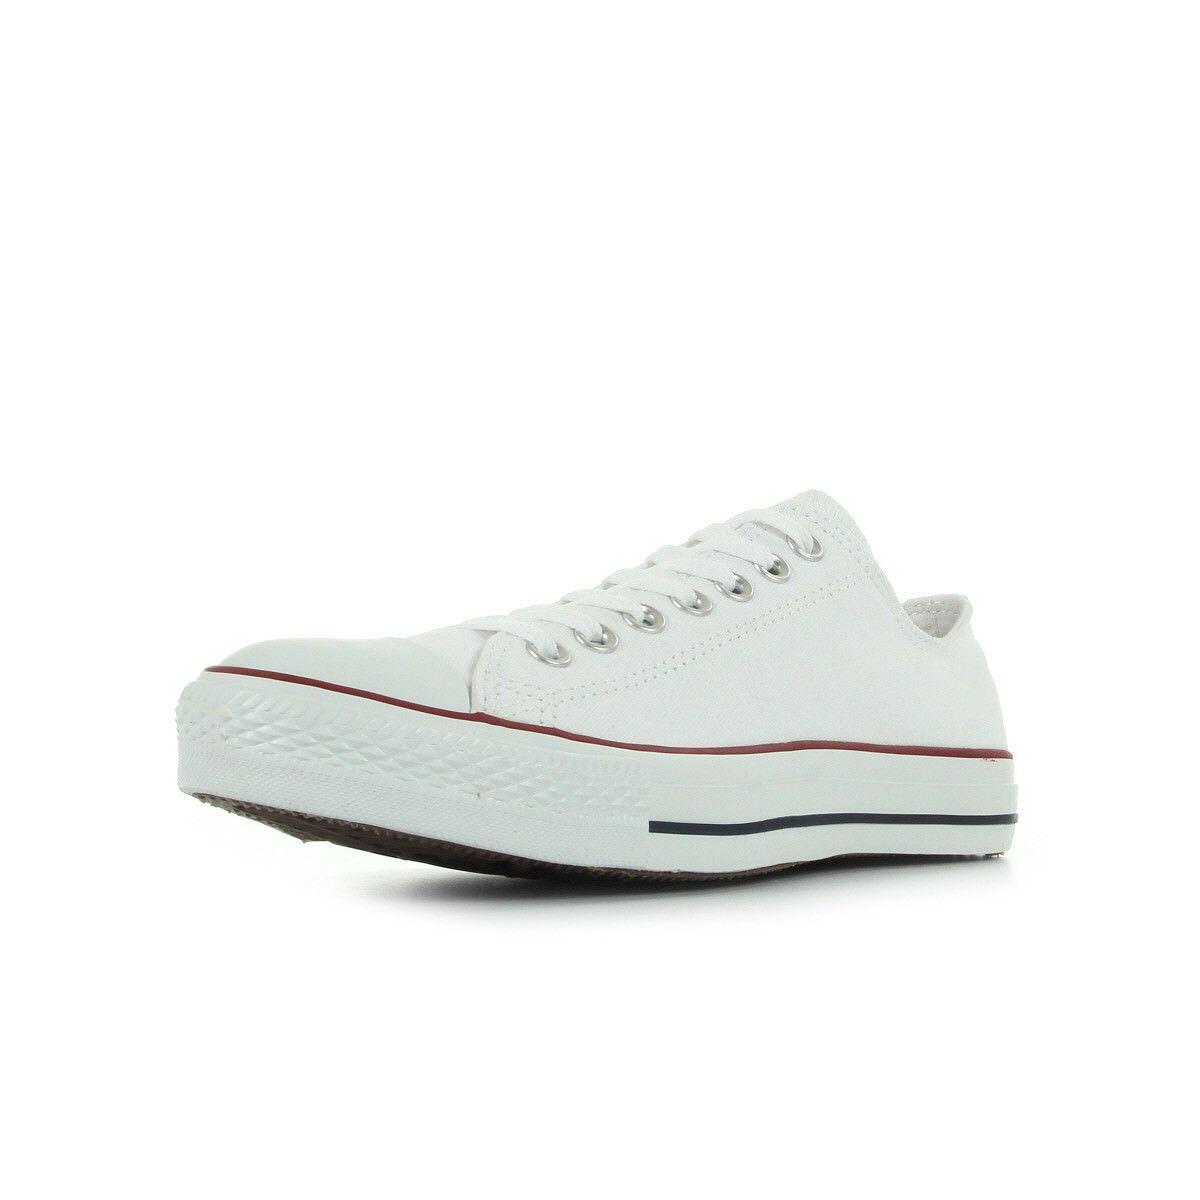 chaussure basket homme converse